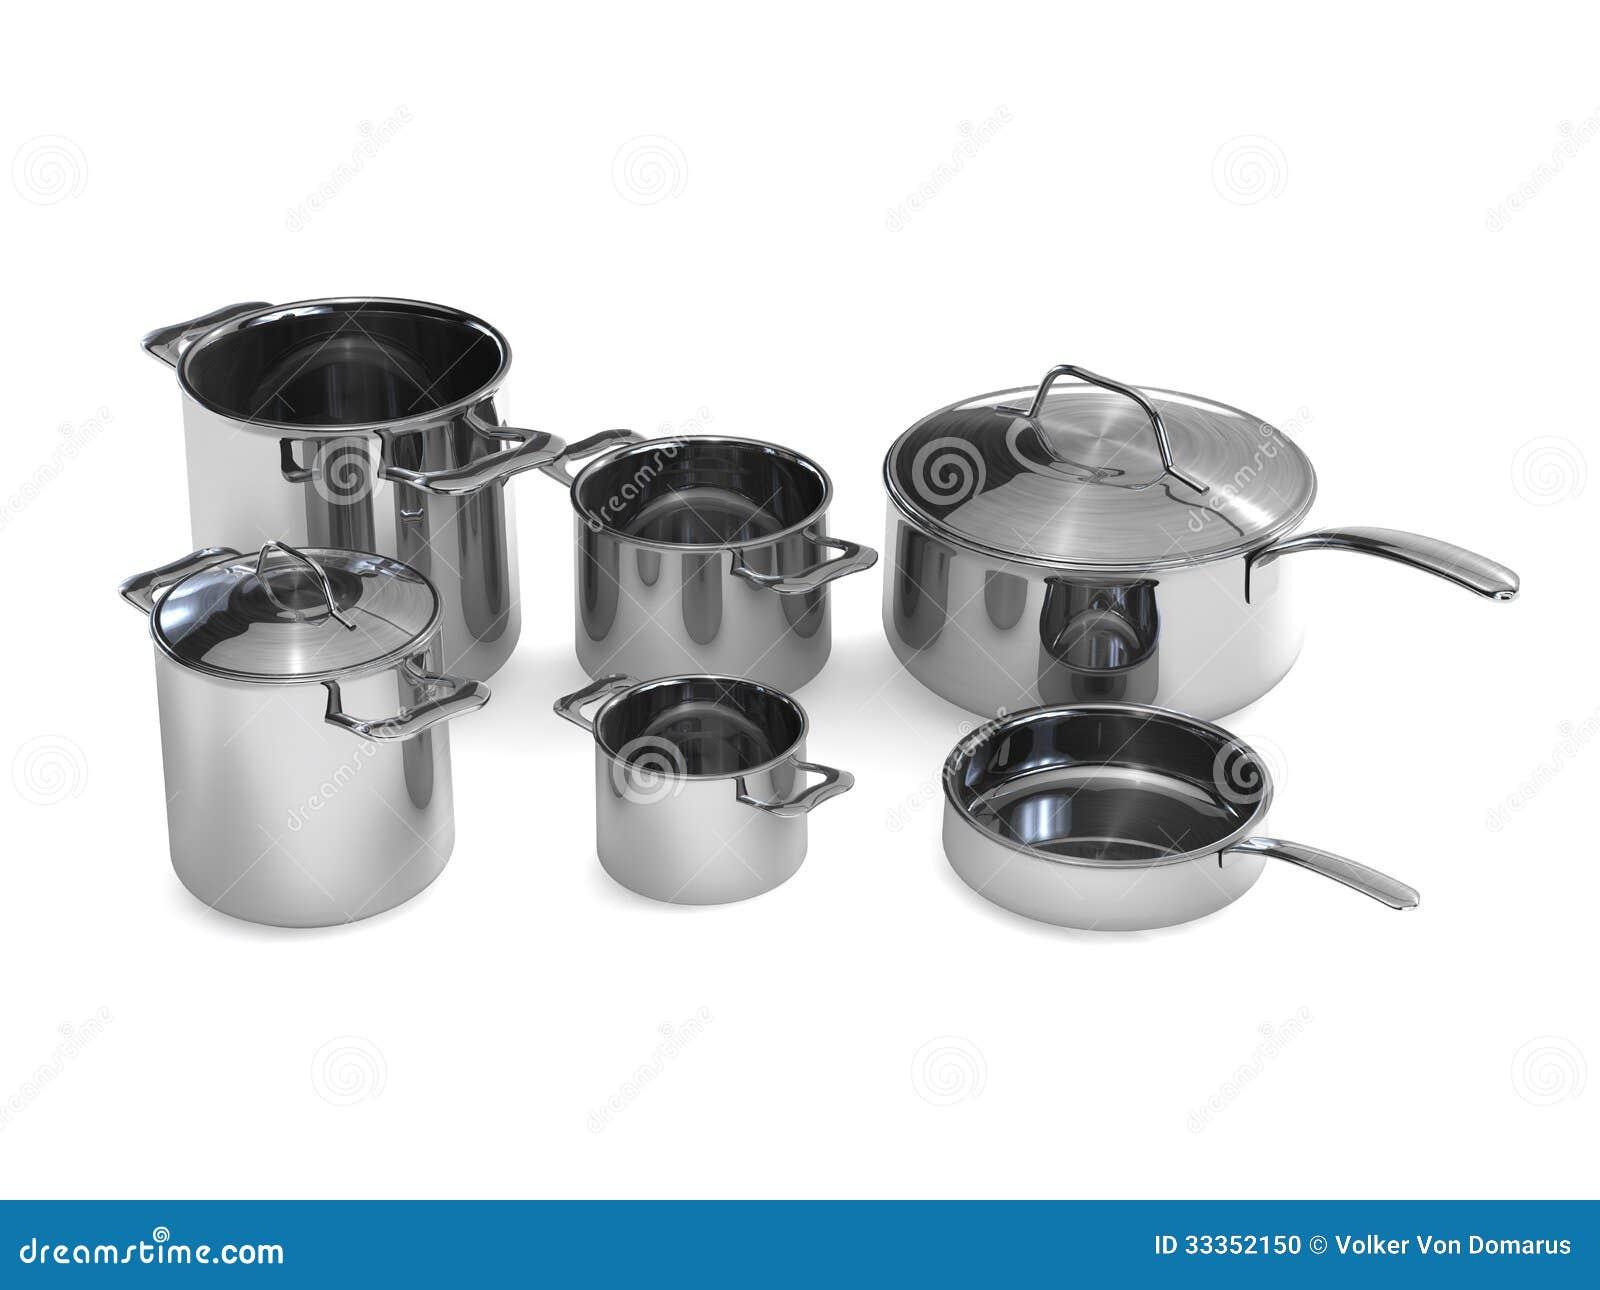 steel pots and pans stock photo image 33352150. Black Bedroom Furniture Sets. Home Design Ideas